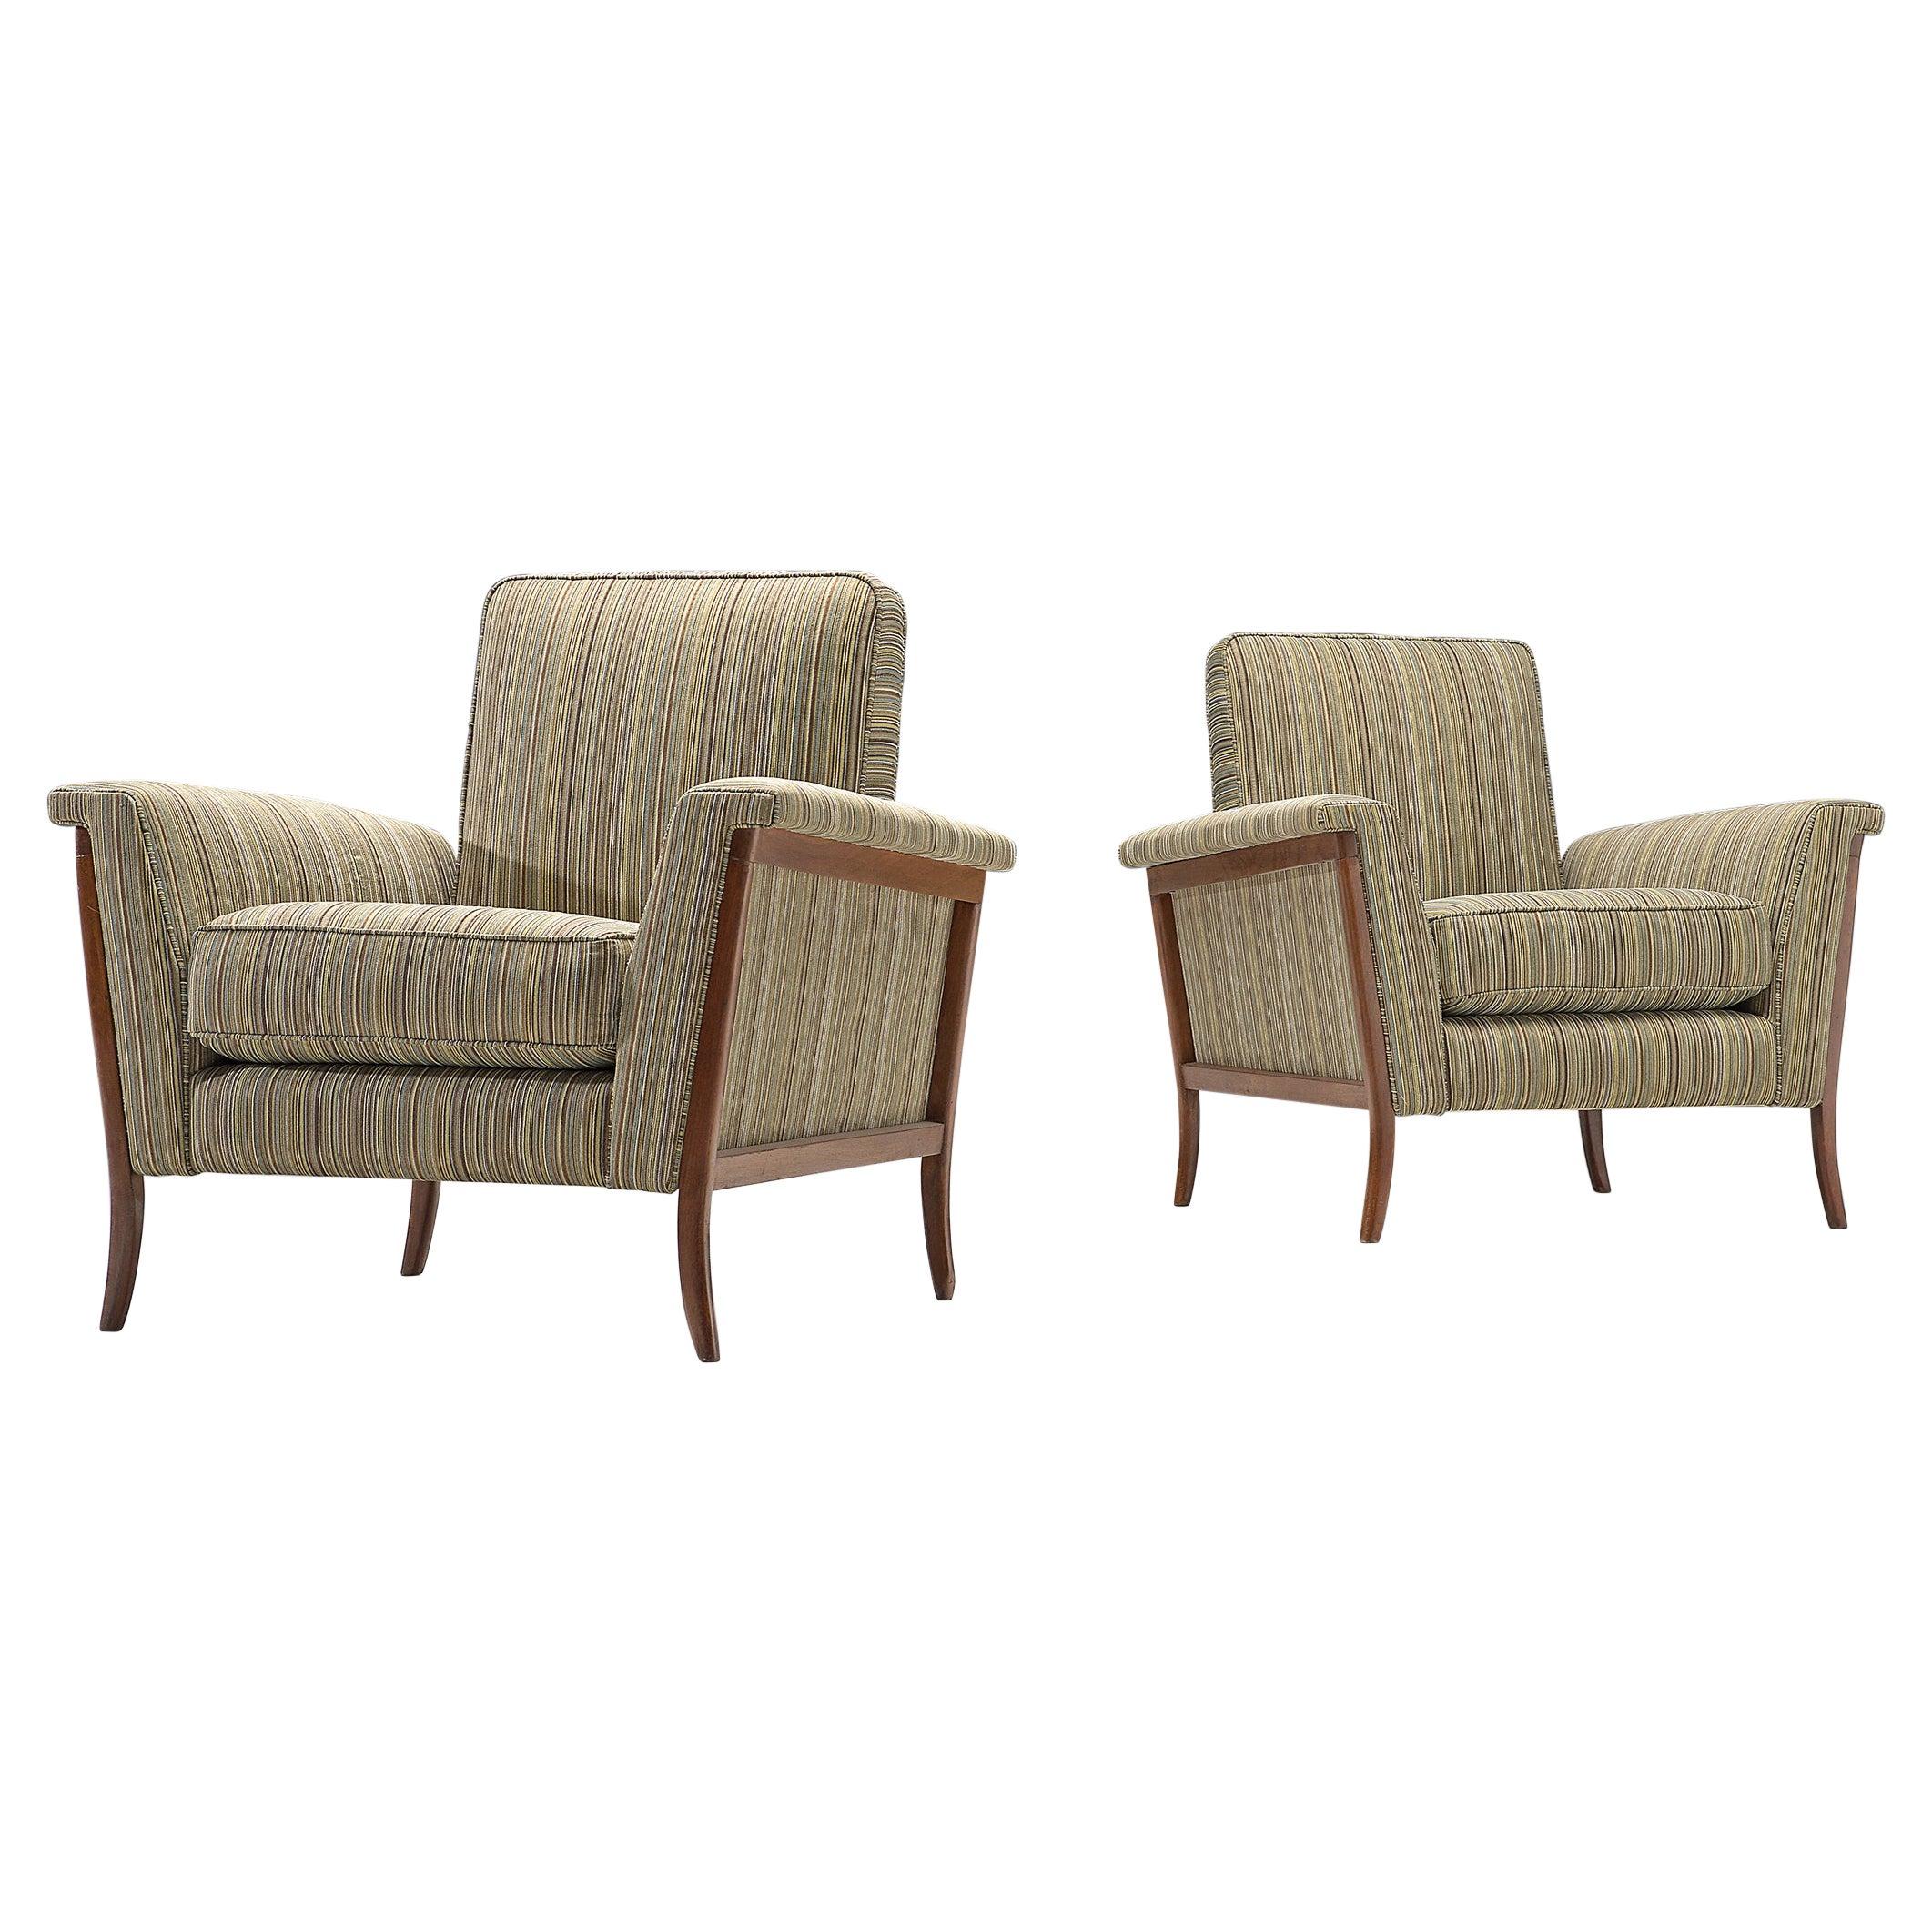 Pair of Brazilian Lounge Chairs in Mahogany